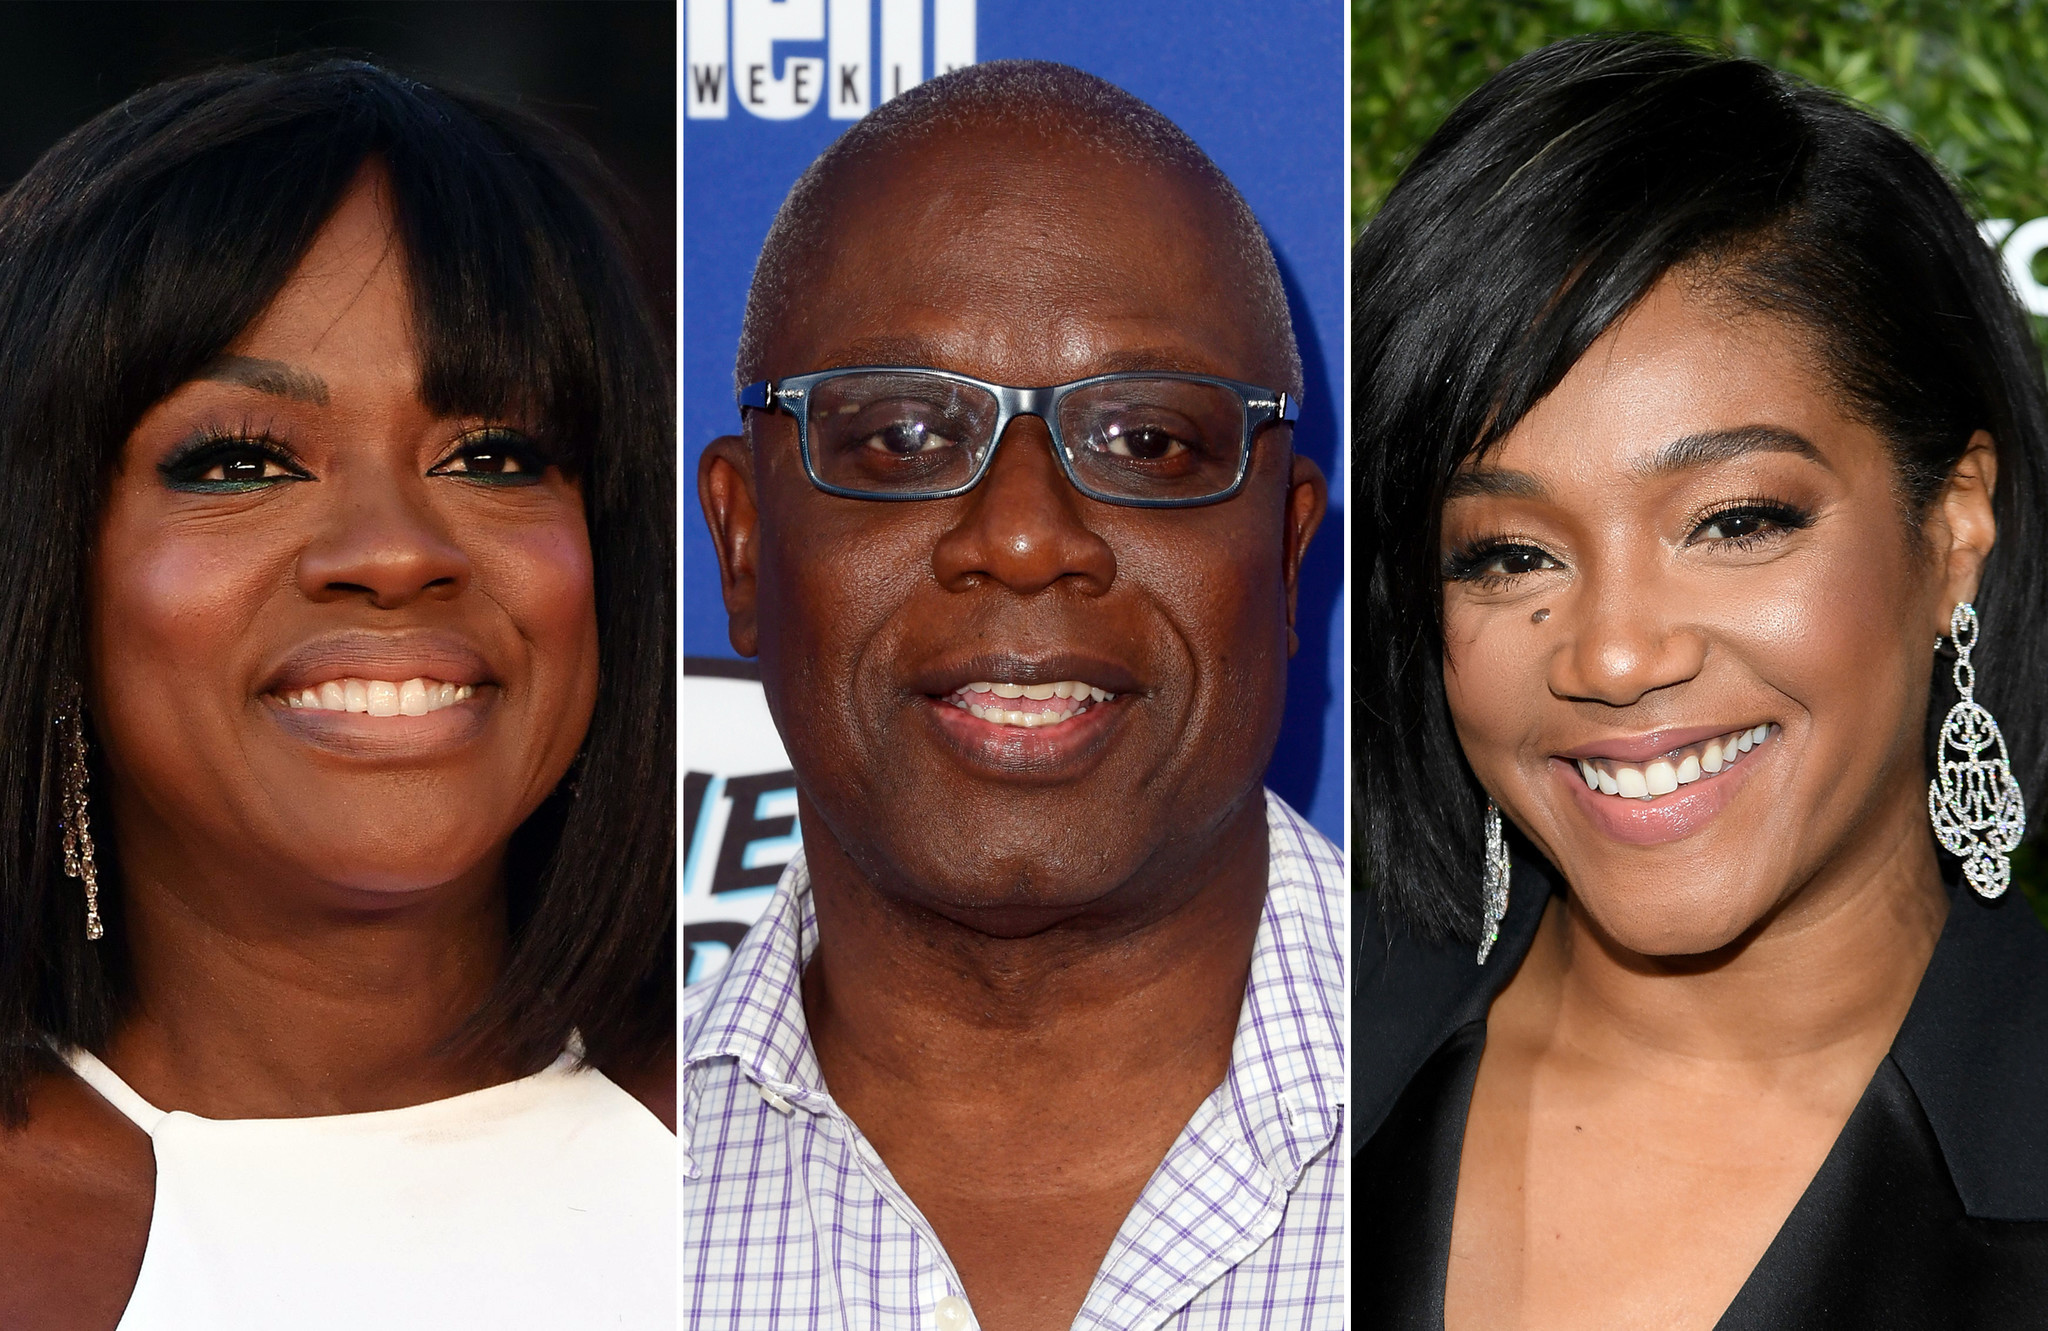 DY-NO-MITE! Viola Davis, Andre Braugher, Tiffany Haddish on board to revive classic sitcom 'Good Times'